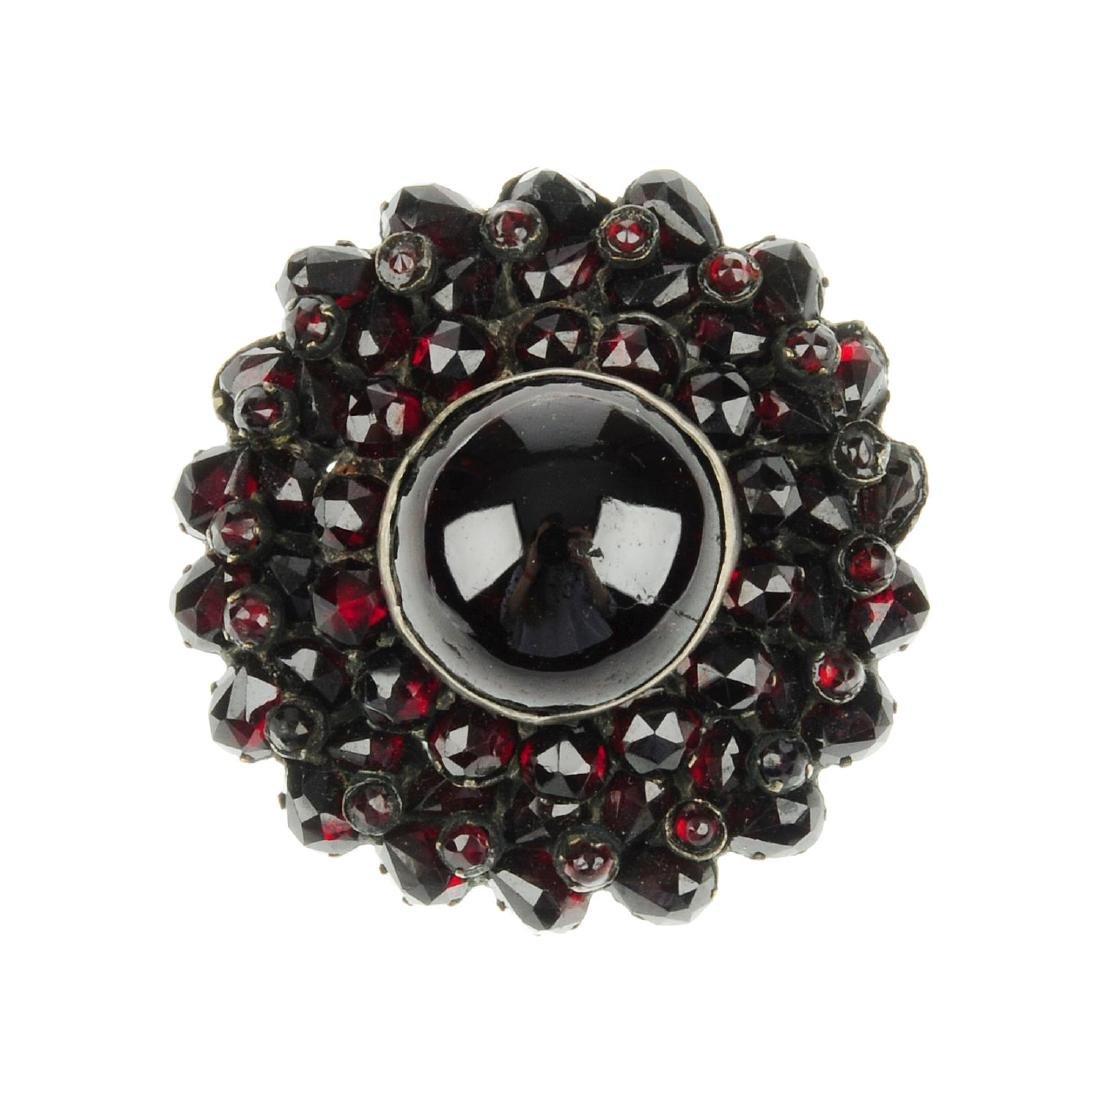 A garnet brooch. Designed as a circular garnet